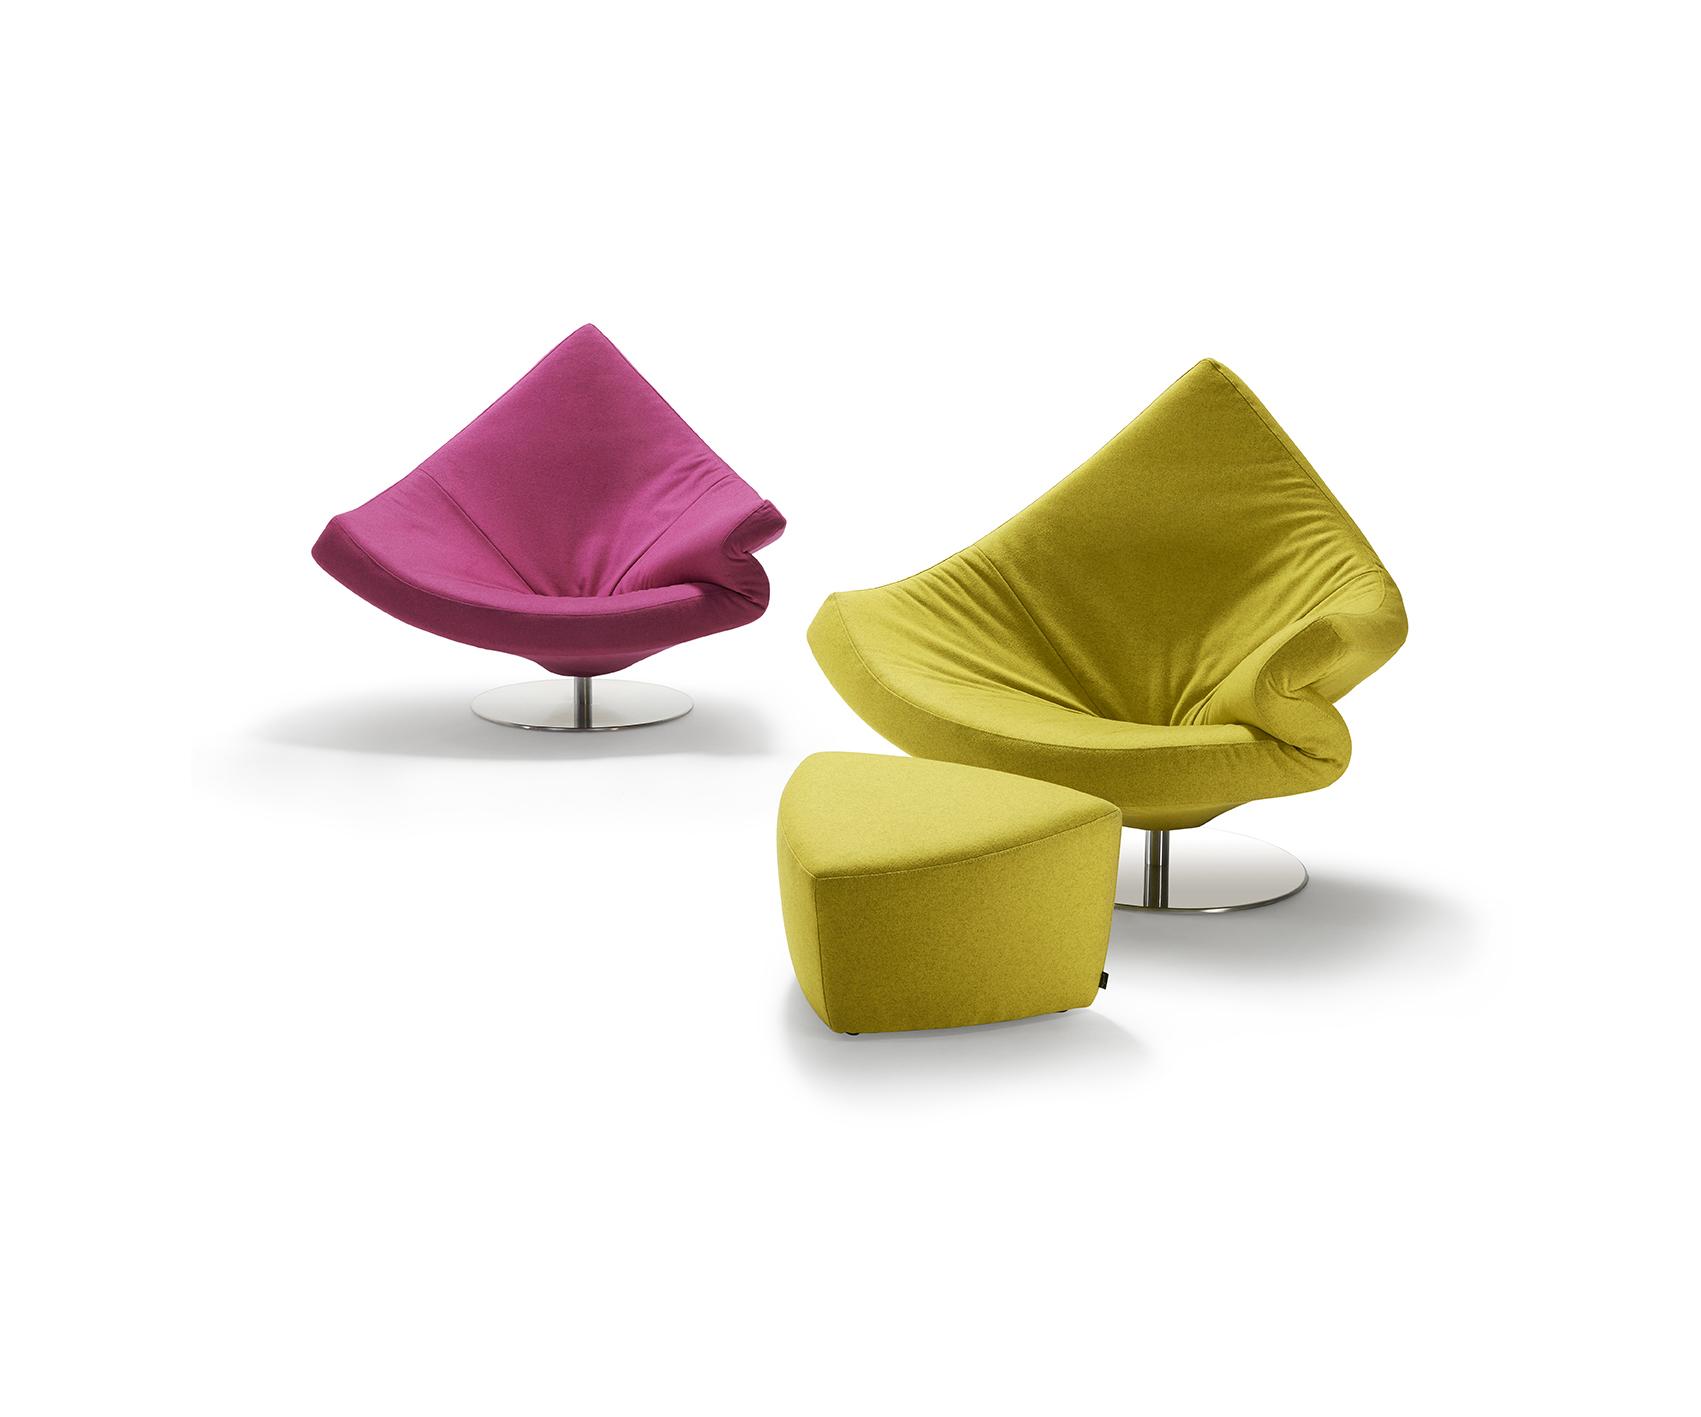 clou relaxsessel von signet. Black Bedroom Furniture Sets. Home Design Ideas